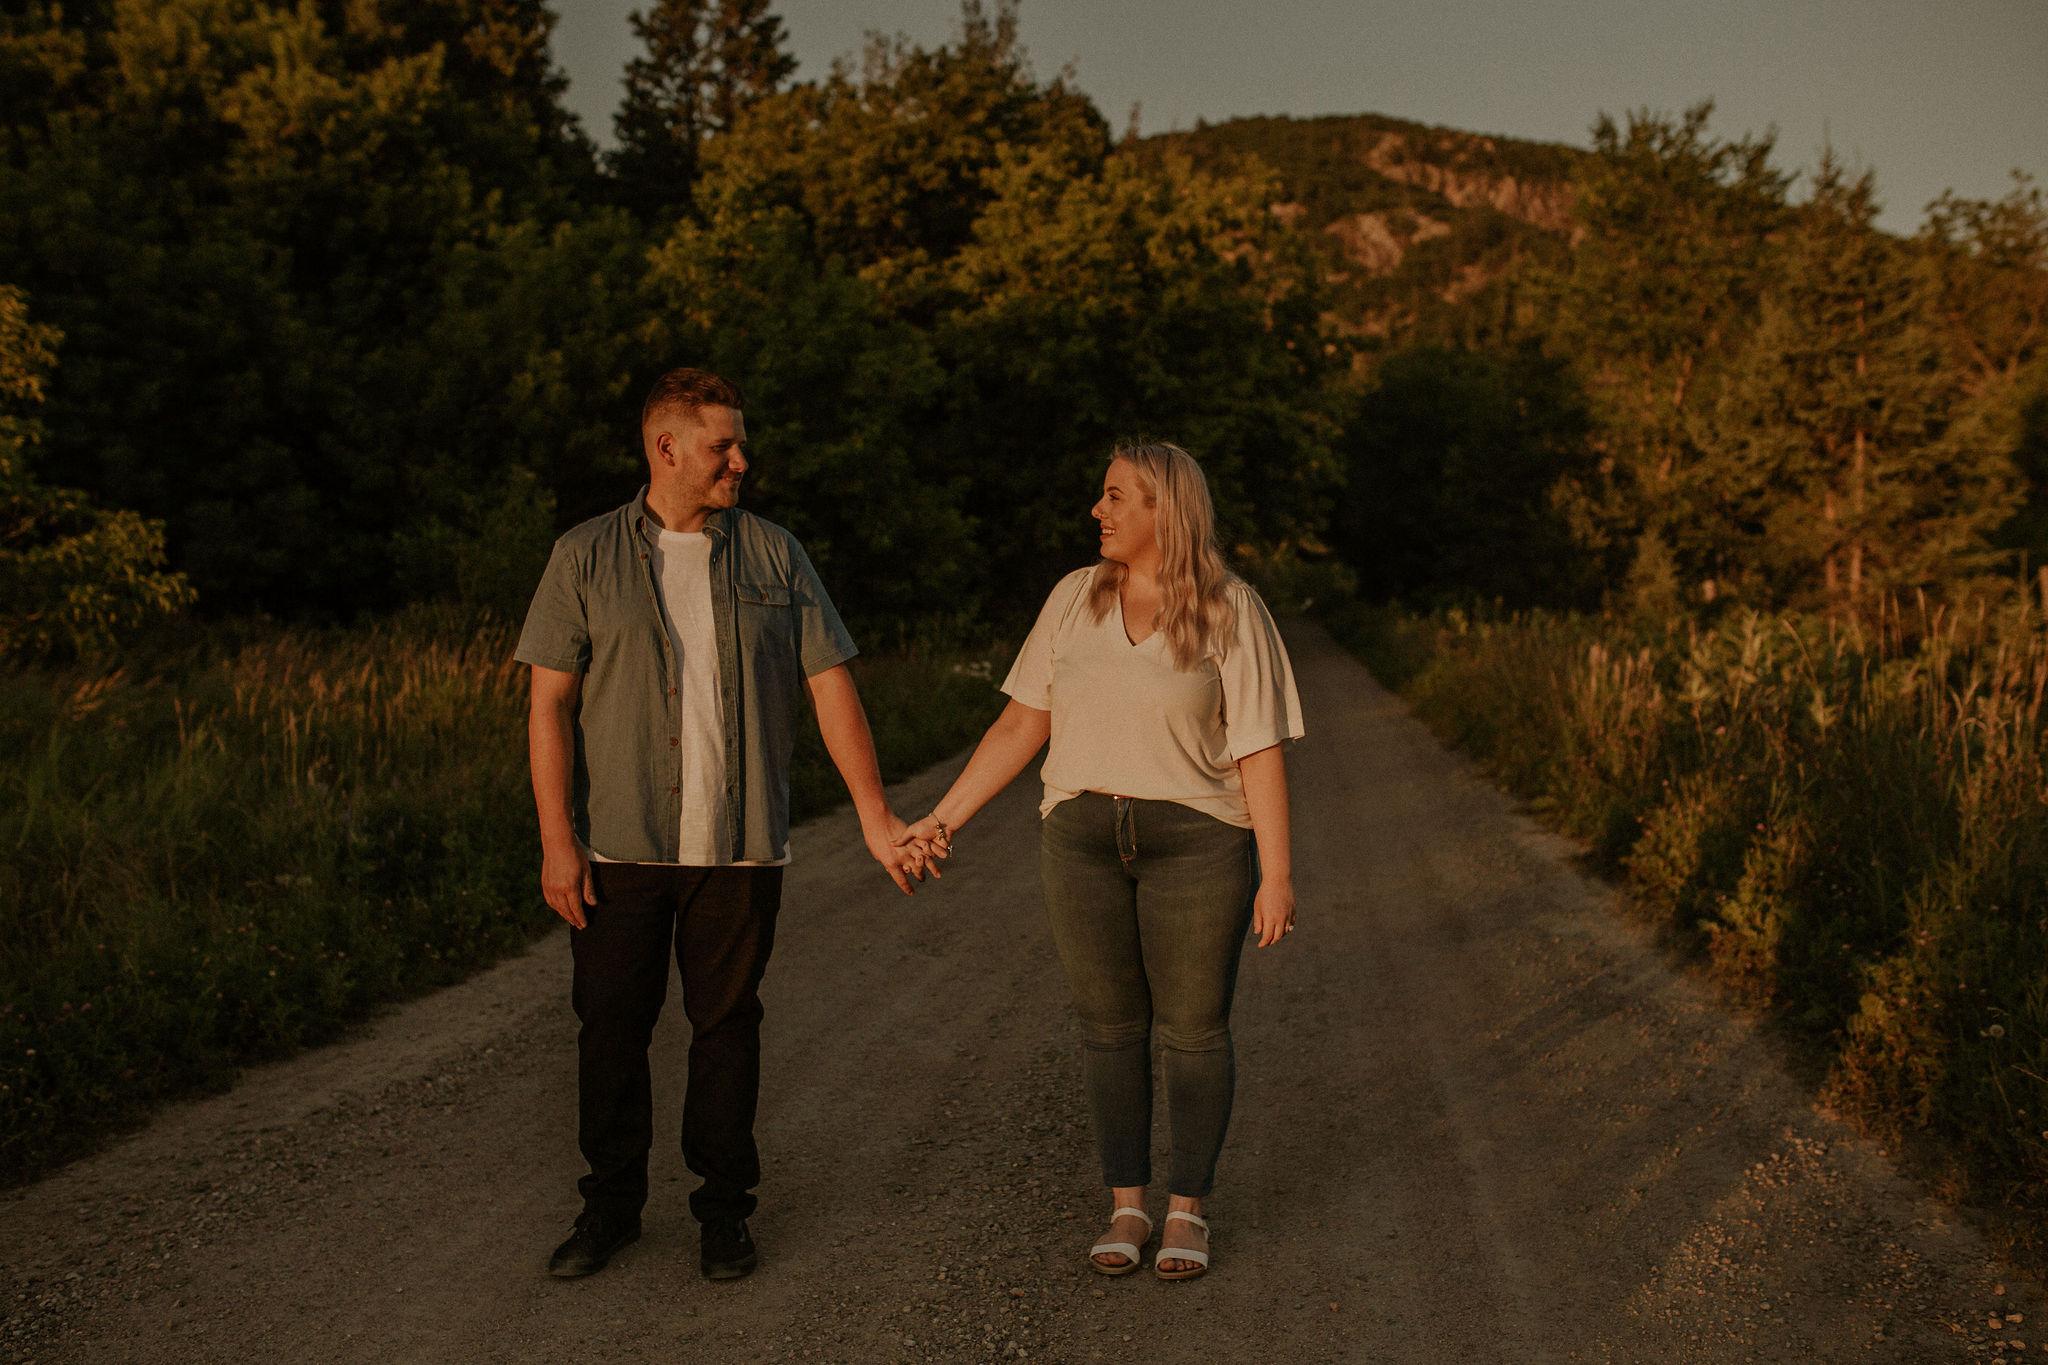 Engagement+photoshoot+aura+photographie+mountains+luskville+photographer